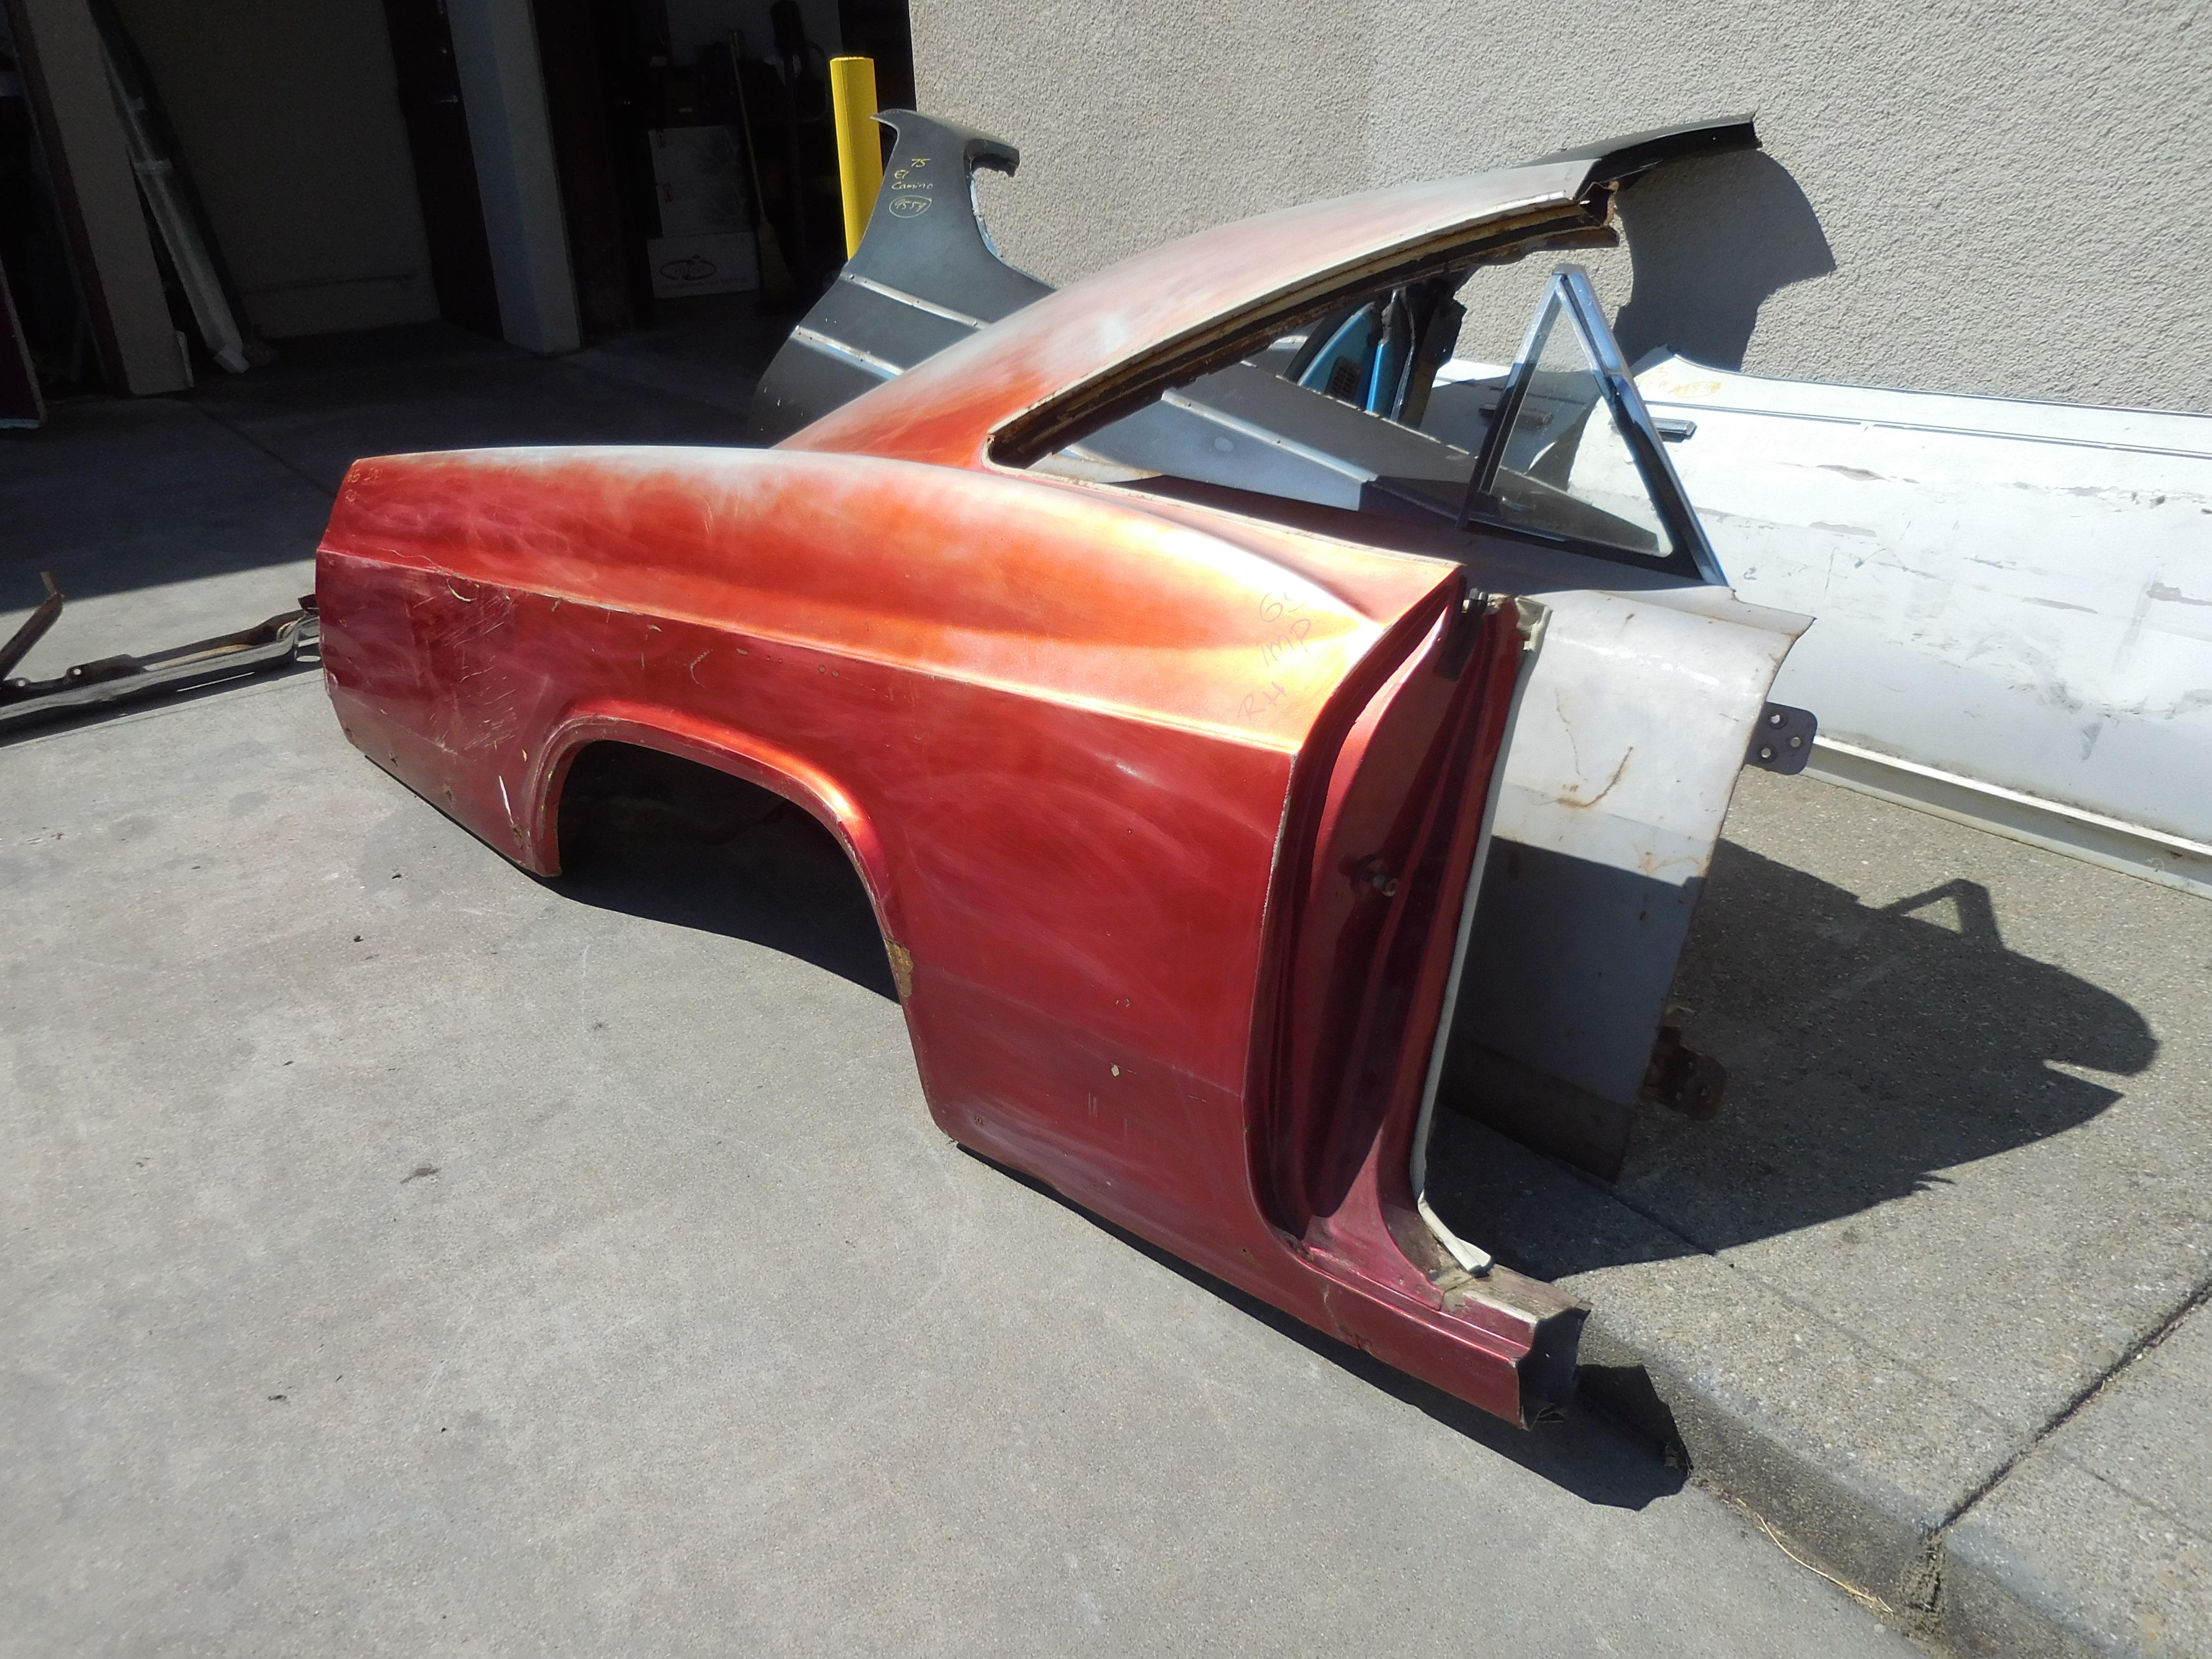 1965 Chevrolet Impala Right Quarter Panel | GM Sports